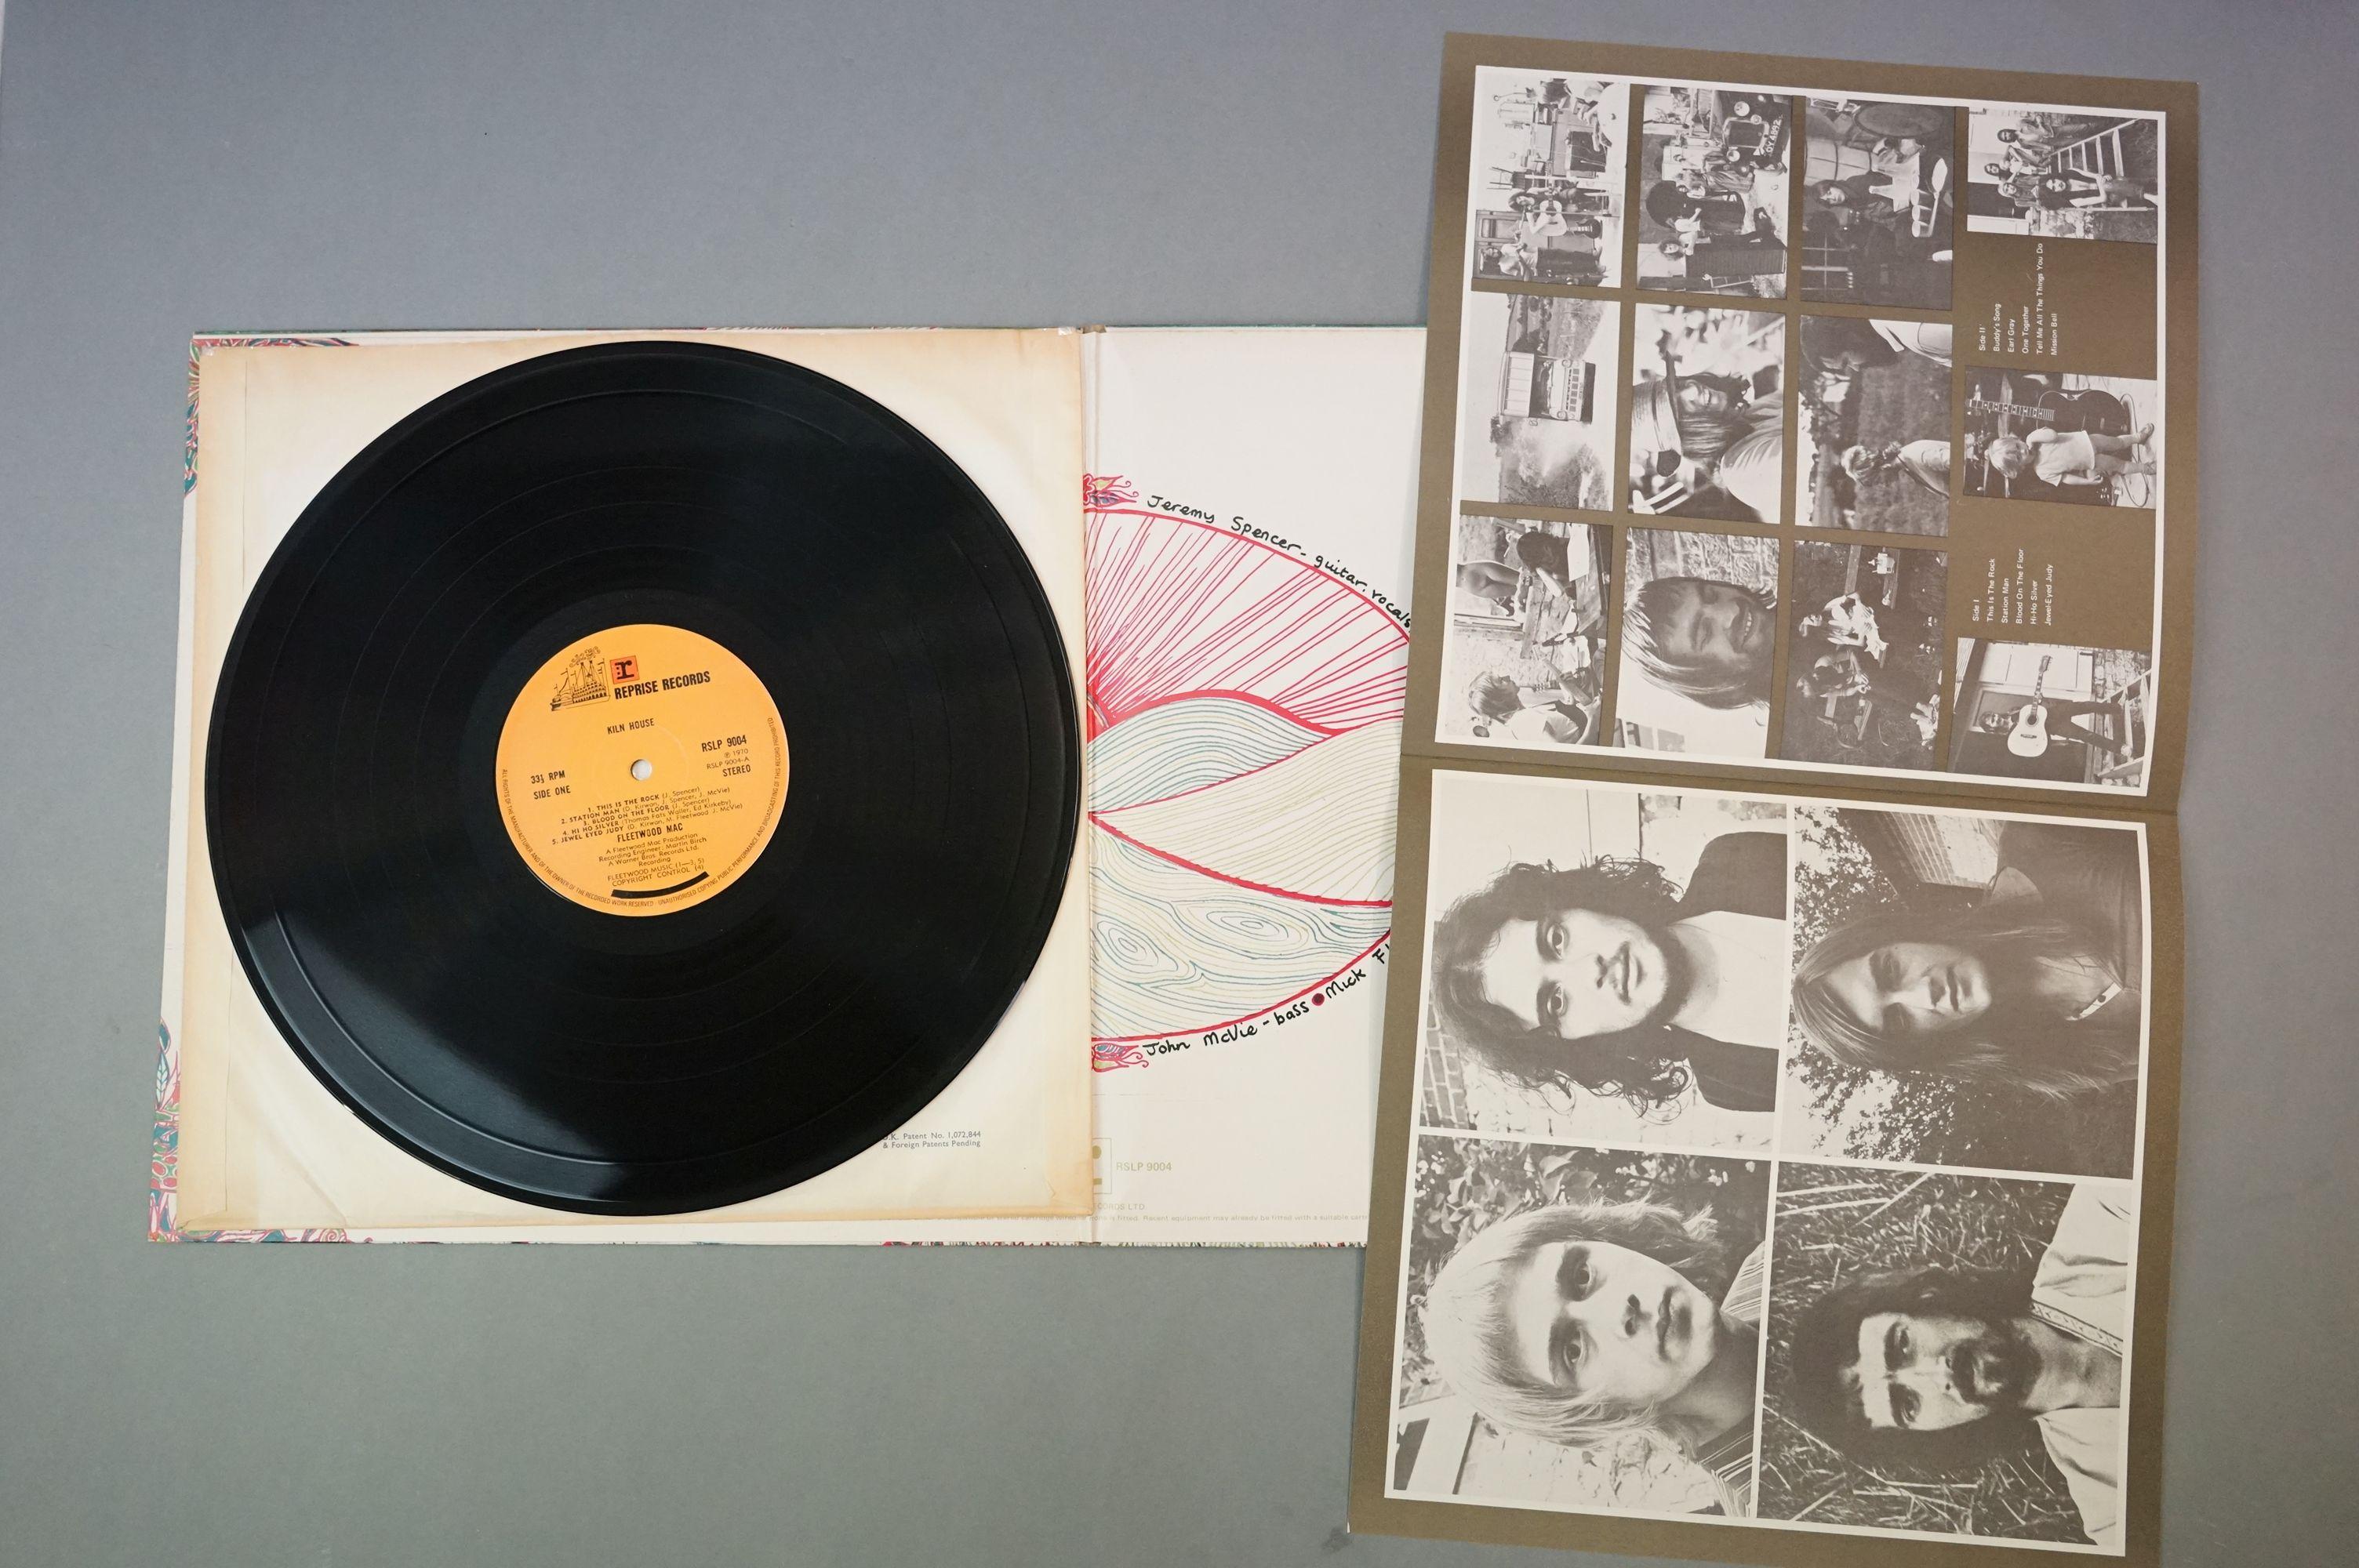 Vinyl - Fleetwood Mac, Kiln House (Reprise RSLP 9004) insert included, sleeve, insert and vinyl vg+ - Image 3 of 14